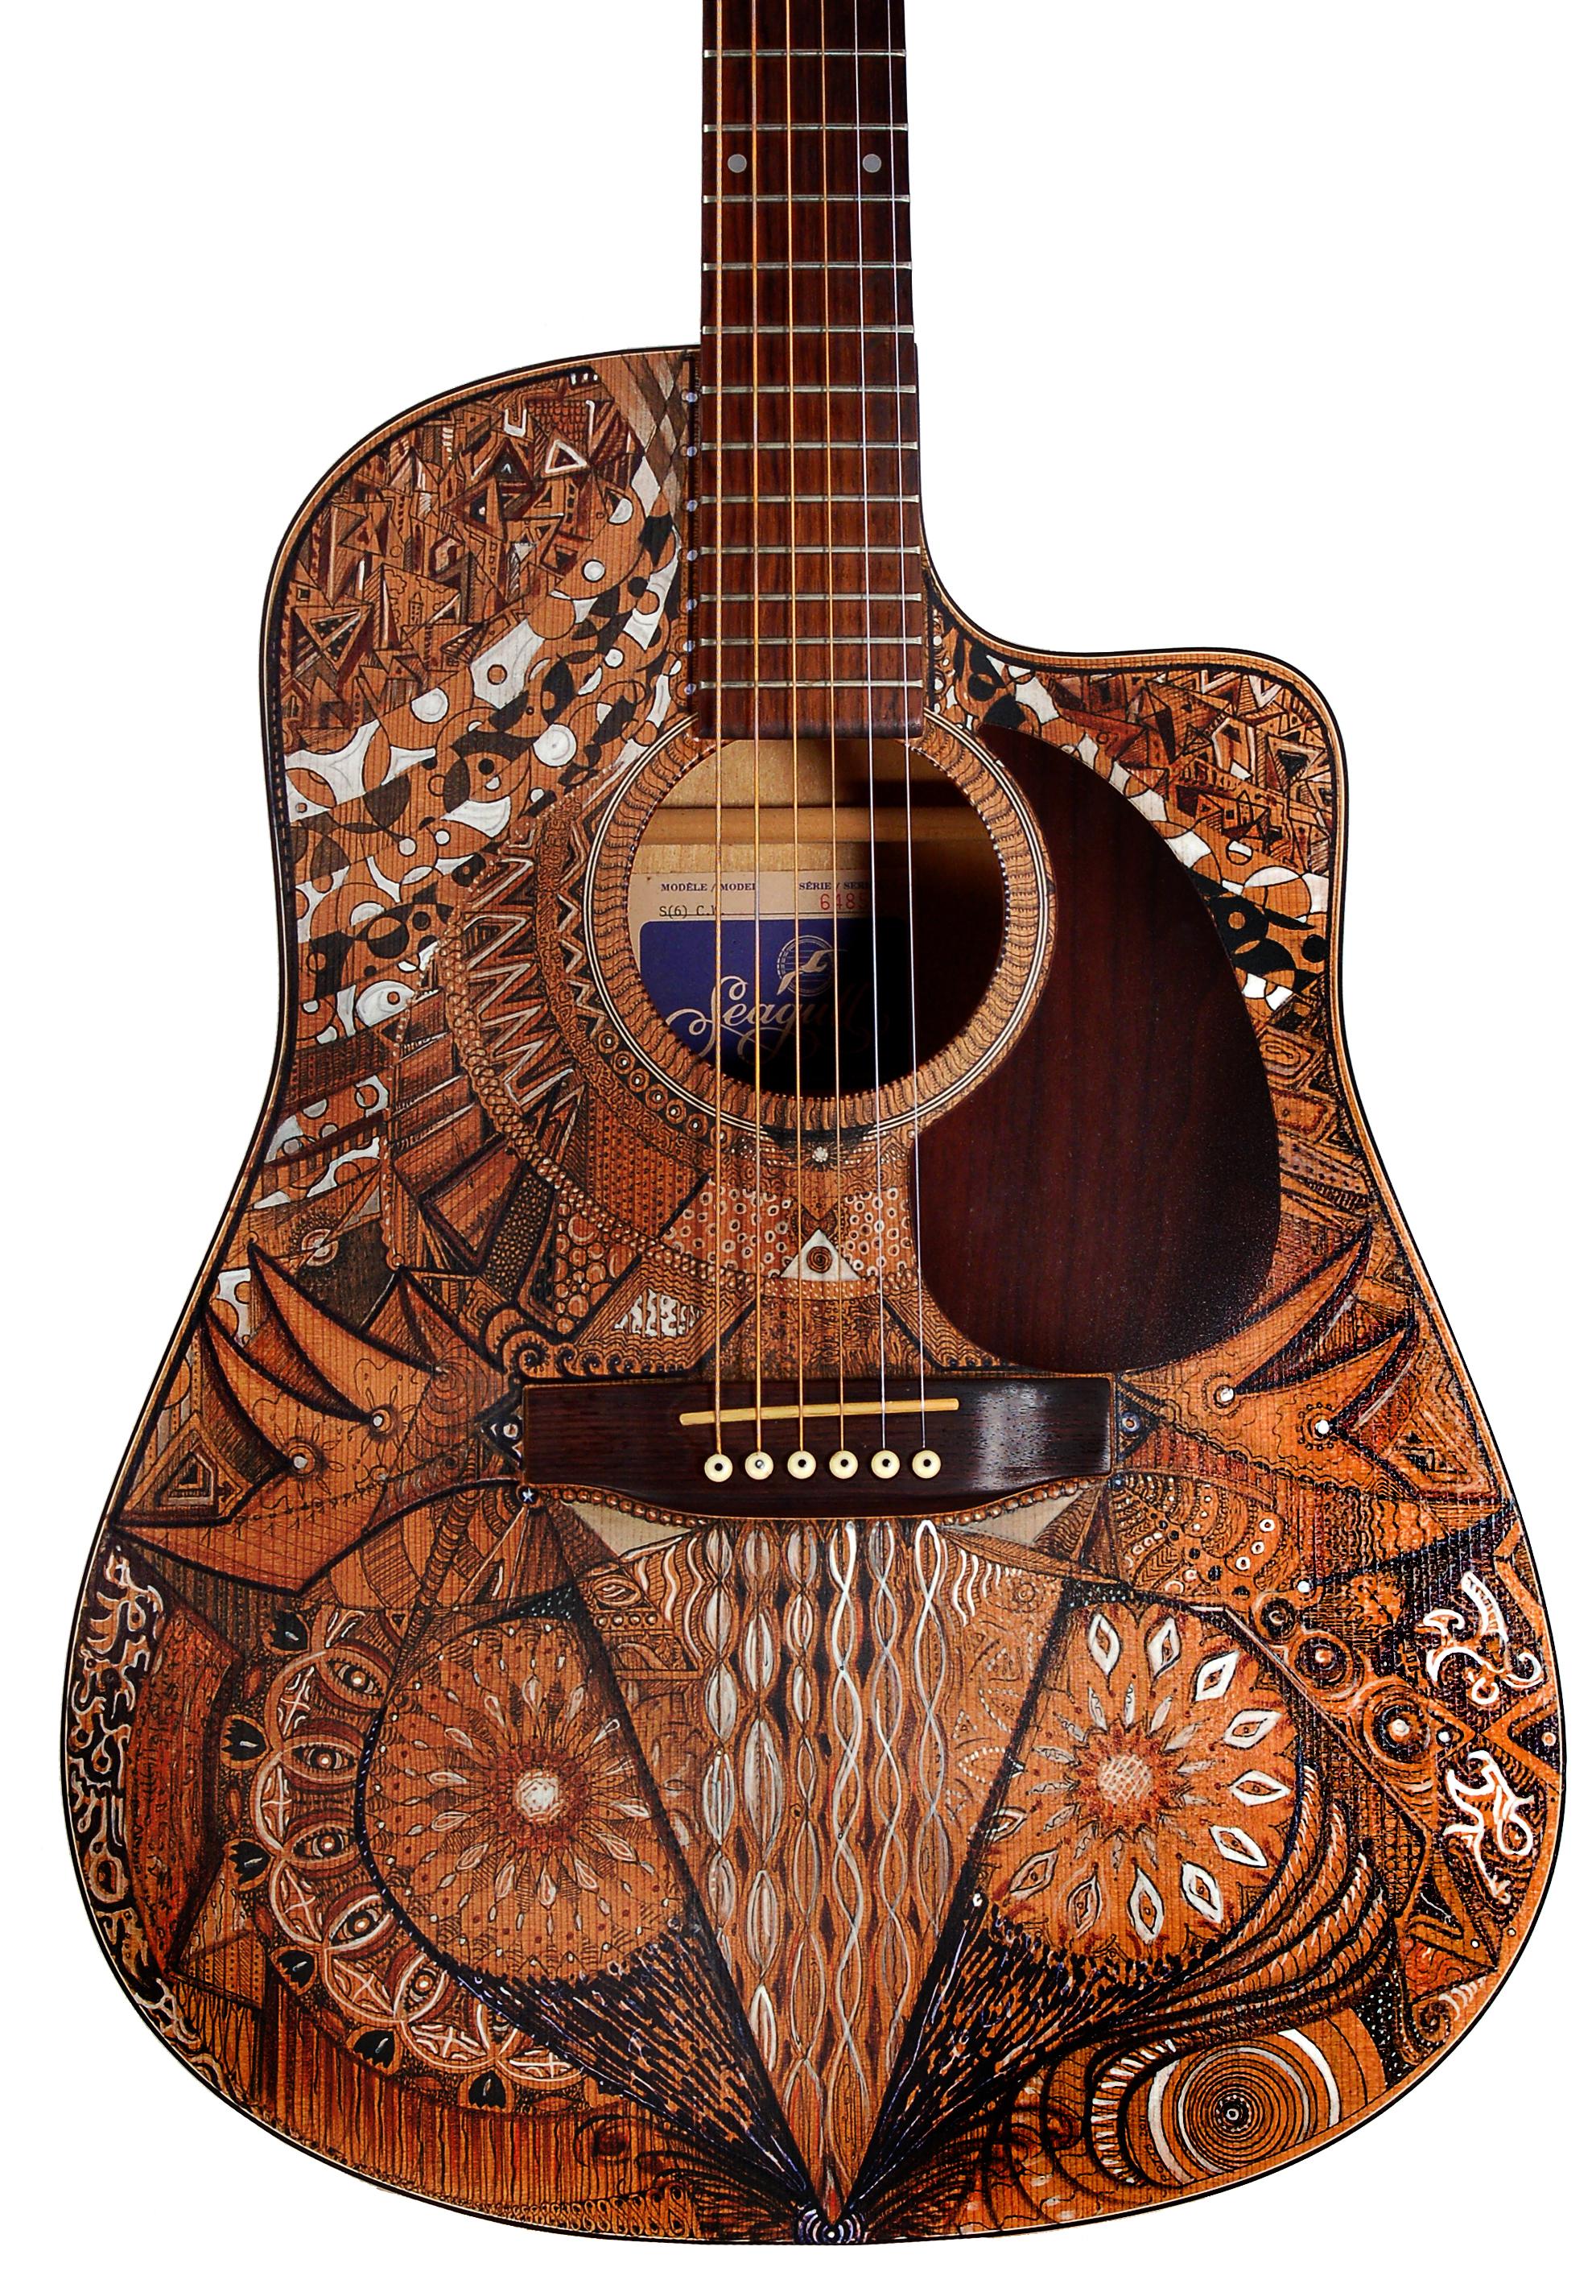 rons-guitar-bodyonly.jpg